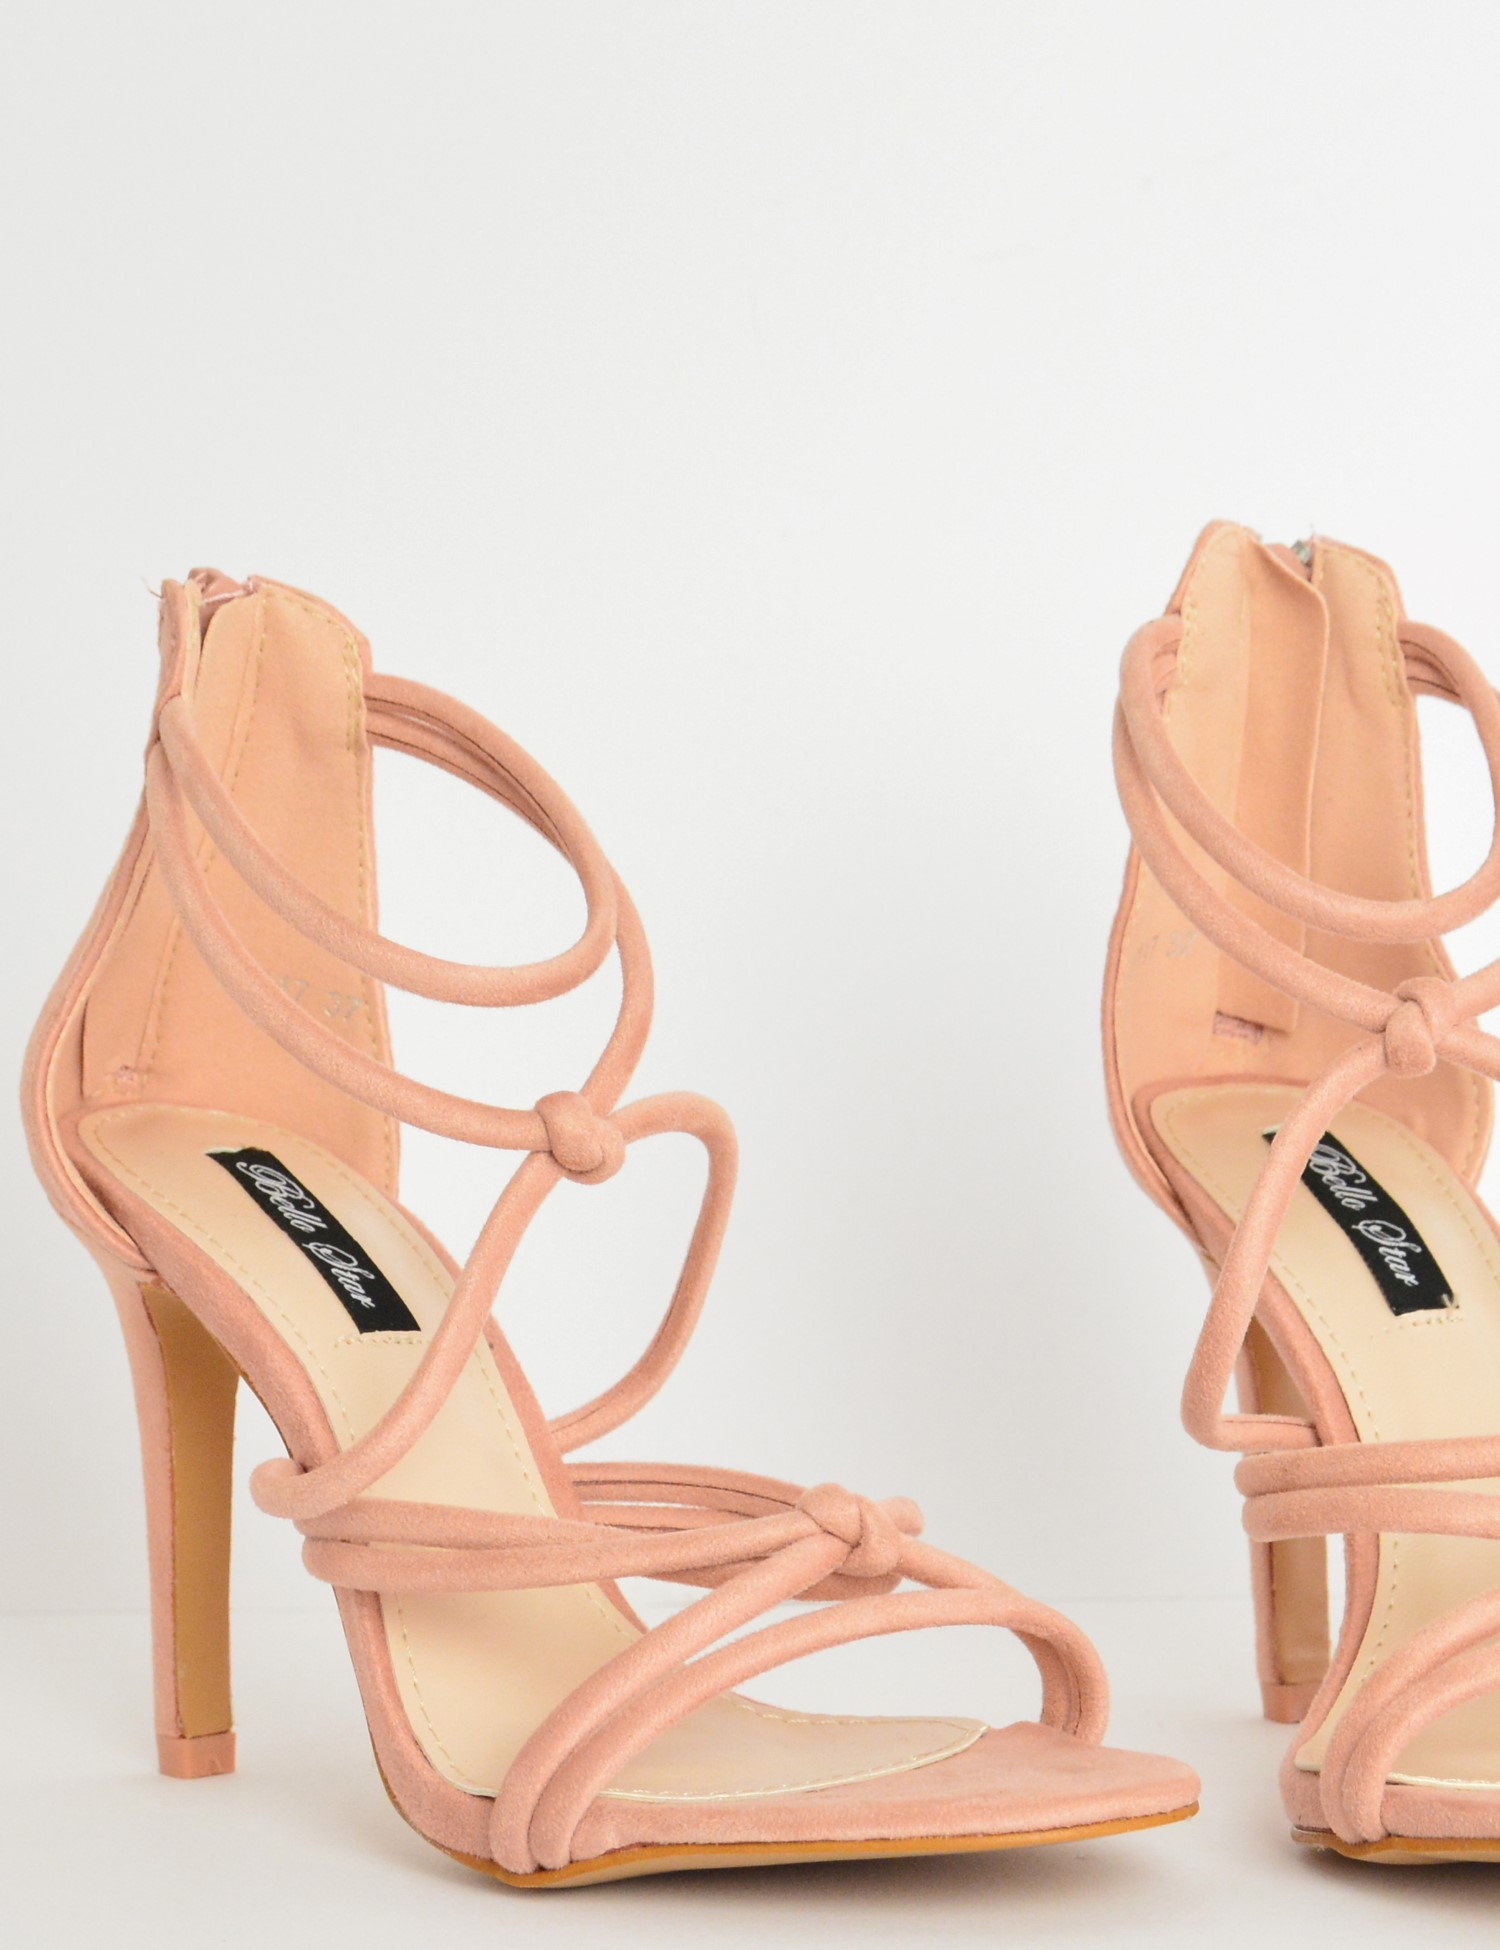 GoldenShopping.gr - Γυναικεία   Παπούτσια dce5bedd9c6